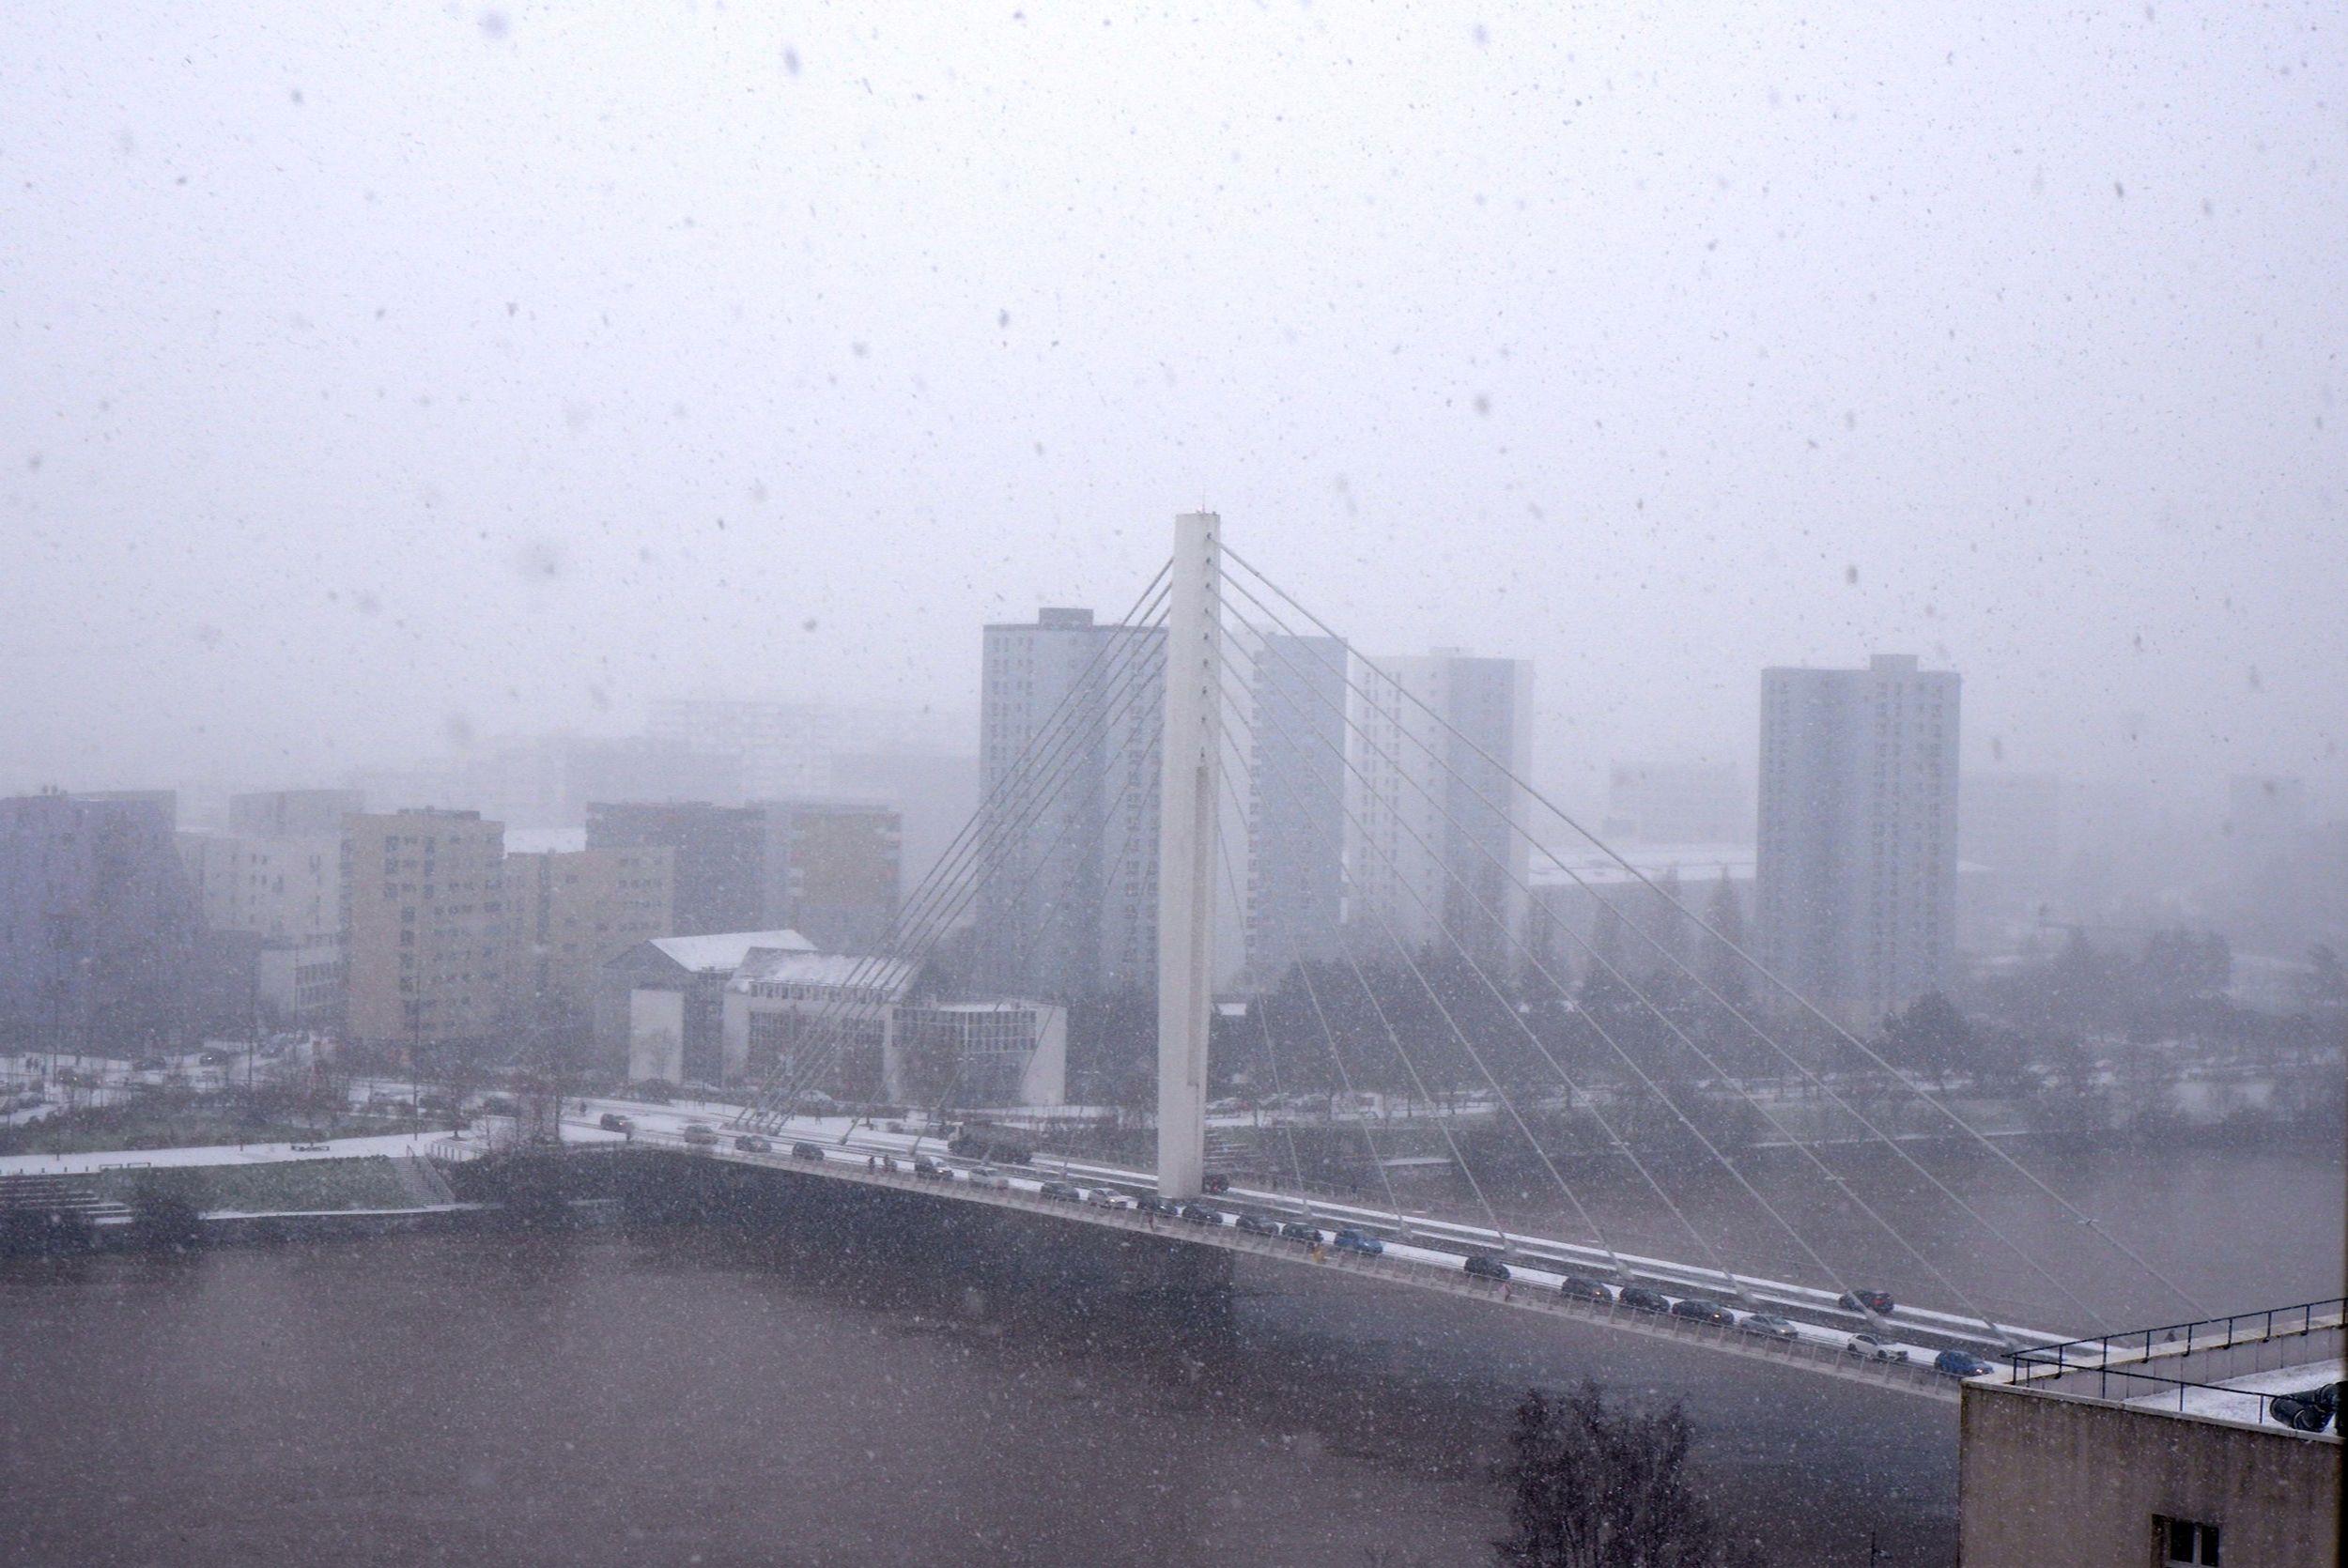 le pont eric tabarly sous la neige